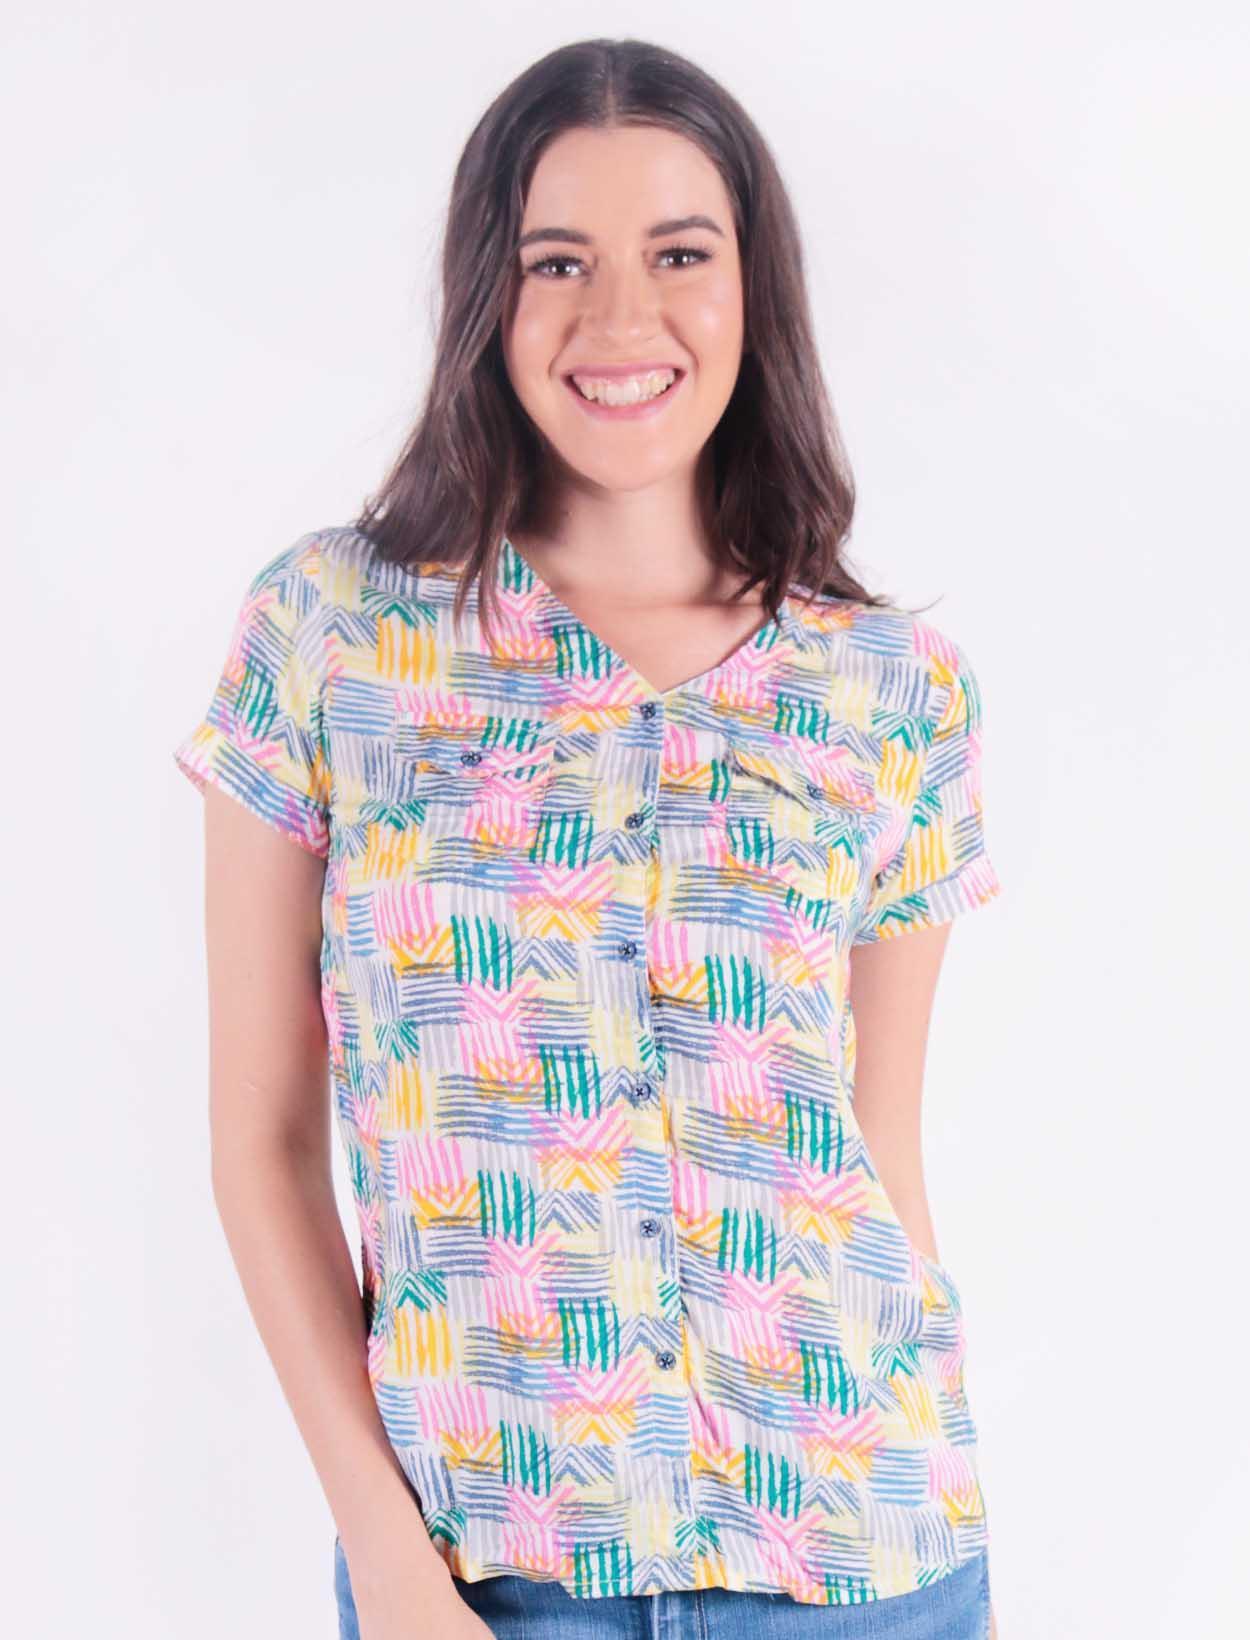 6a088b85874269 Wrangler Philippines: Wrangler price list - Wrangler Polo, Shirts ...